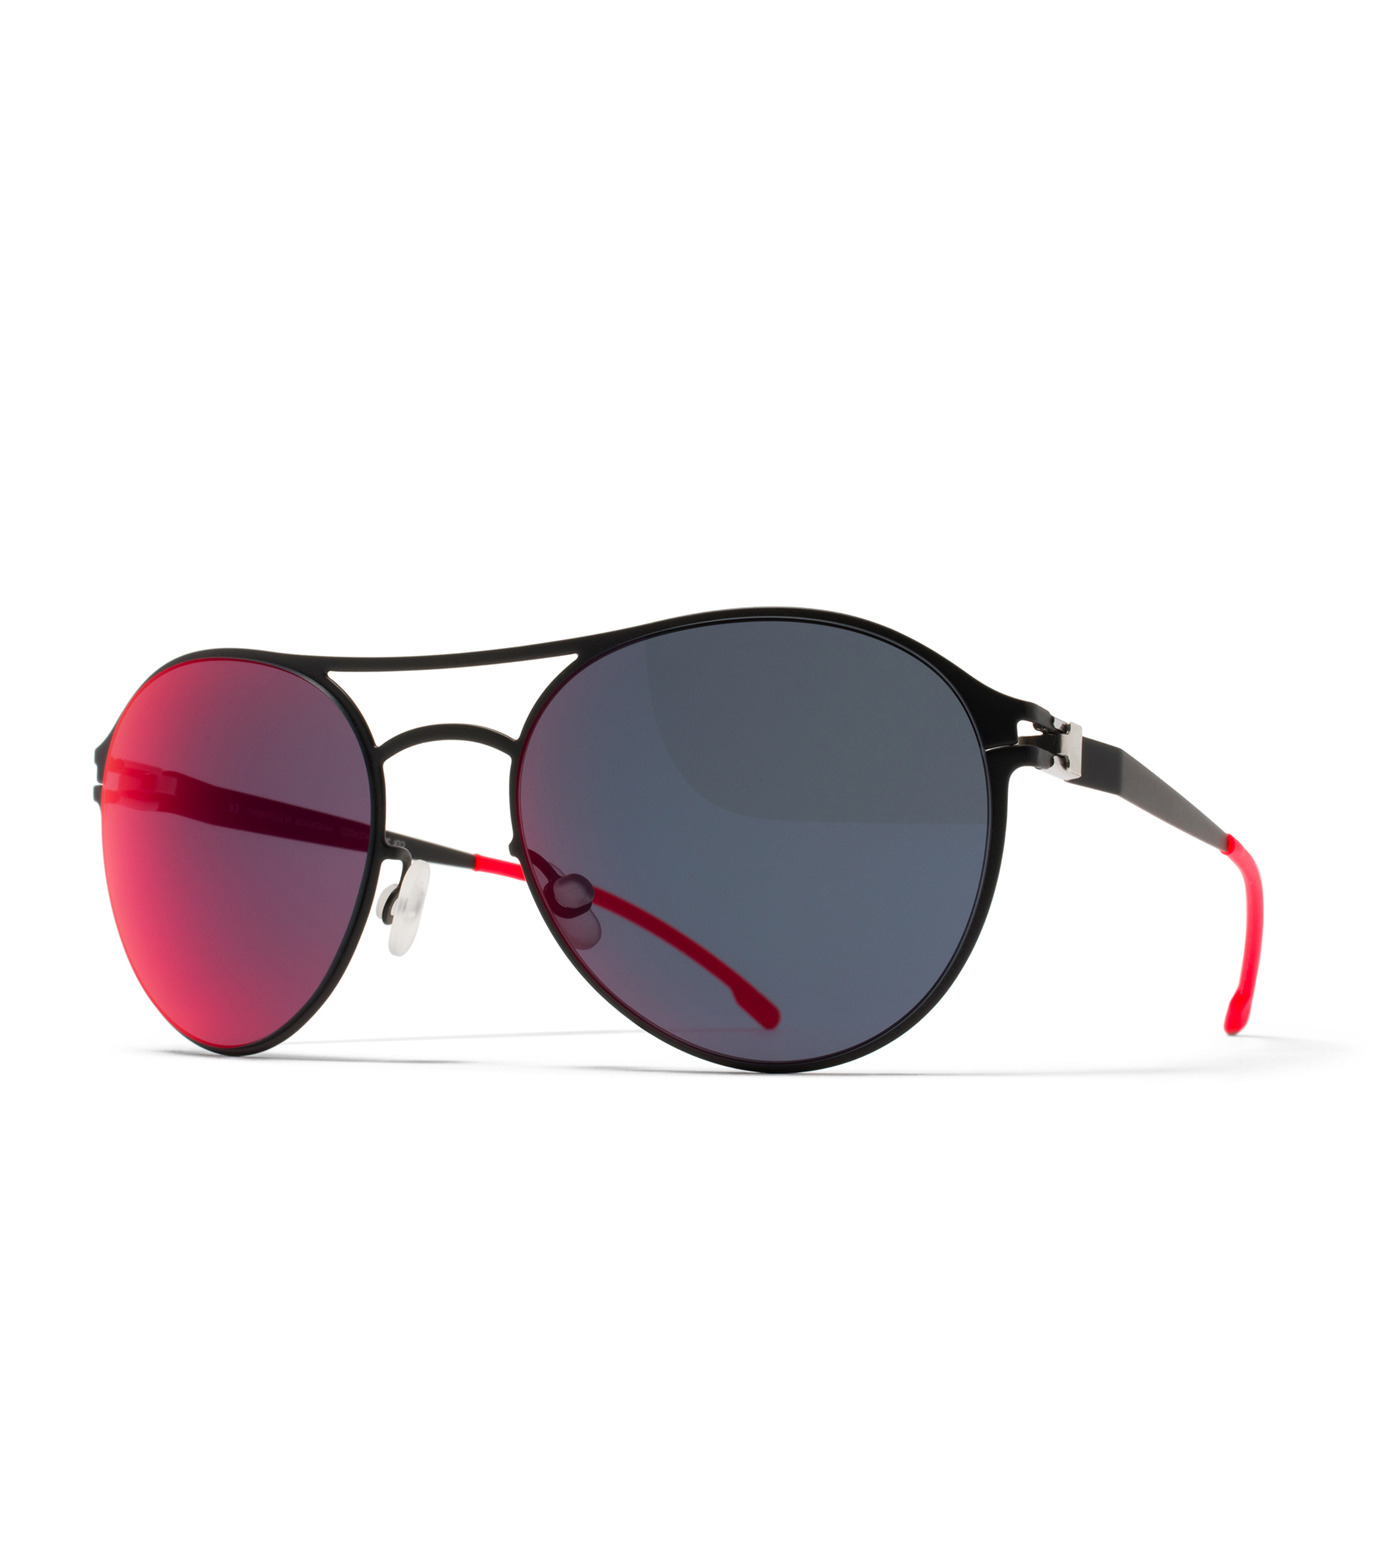 MYKITA(マイキータ)のSPARROW-RED(アイウェア/eyewear)-SPARROW-62 拡大詳細画像1